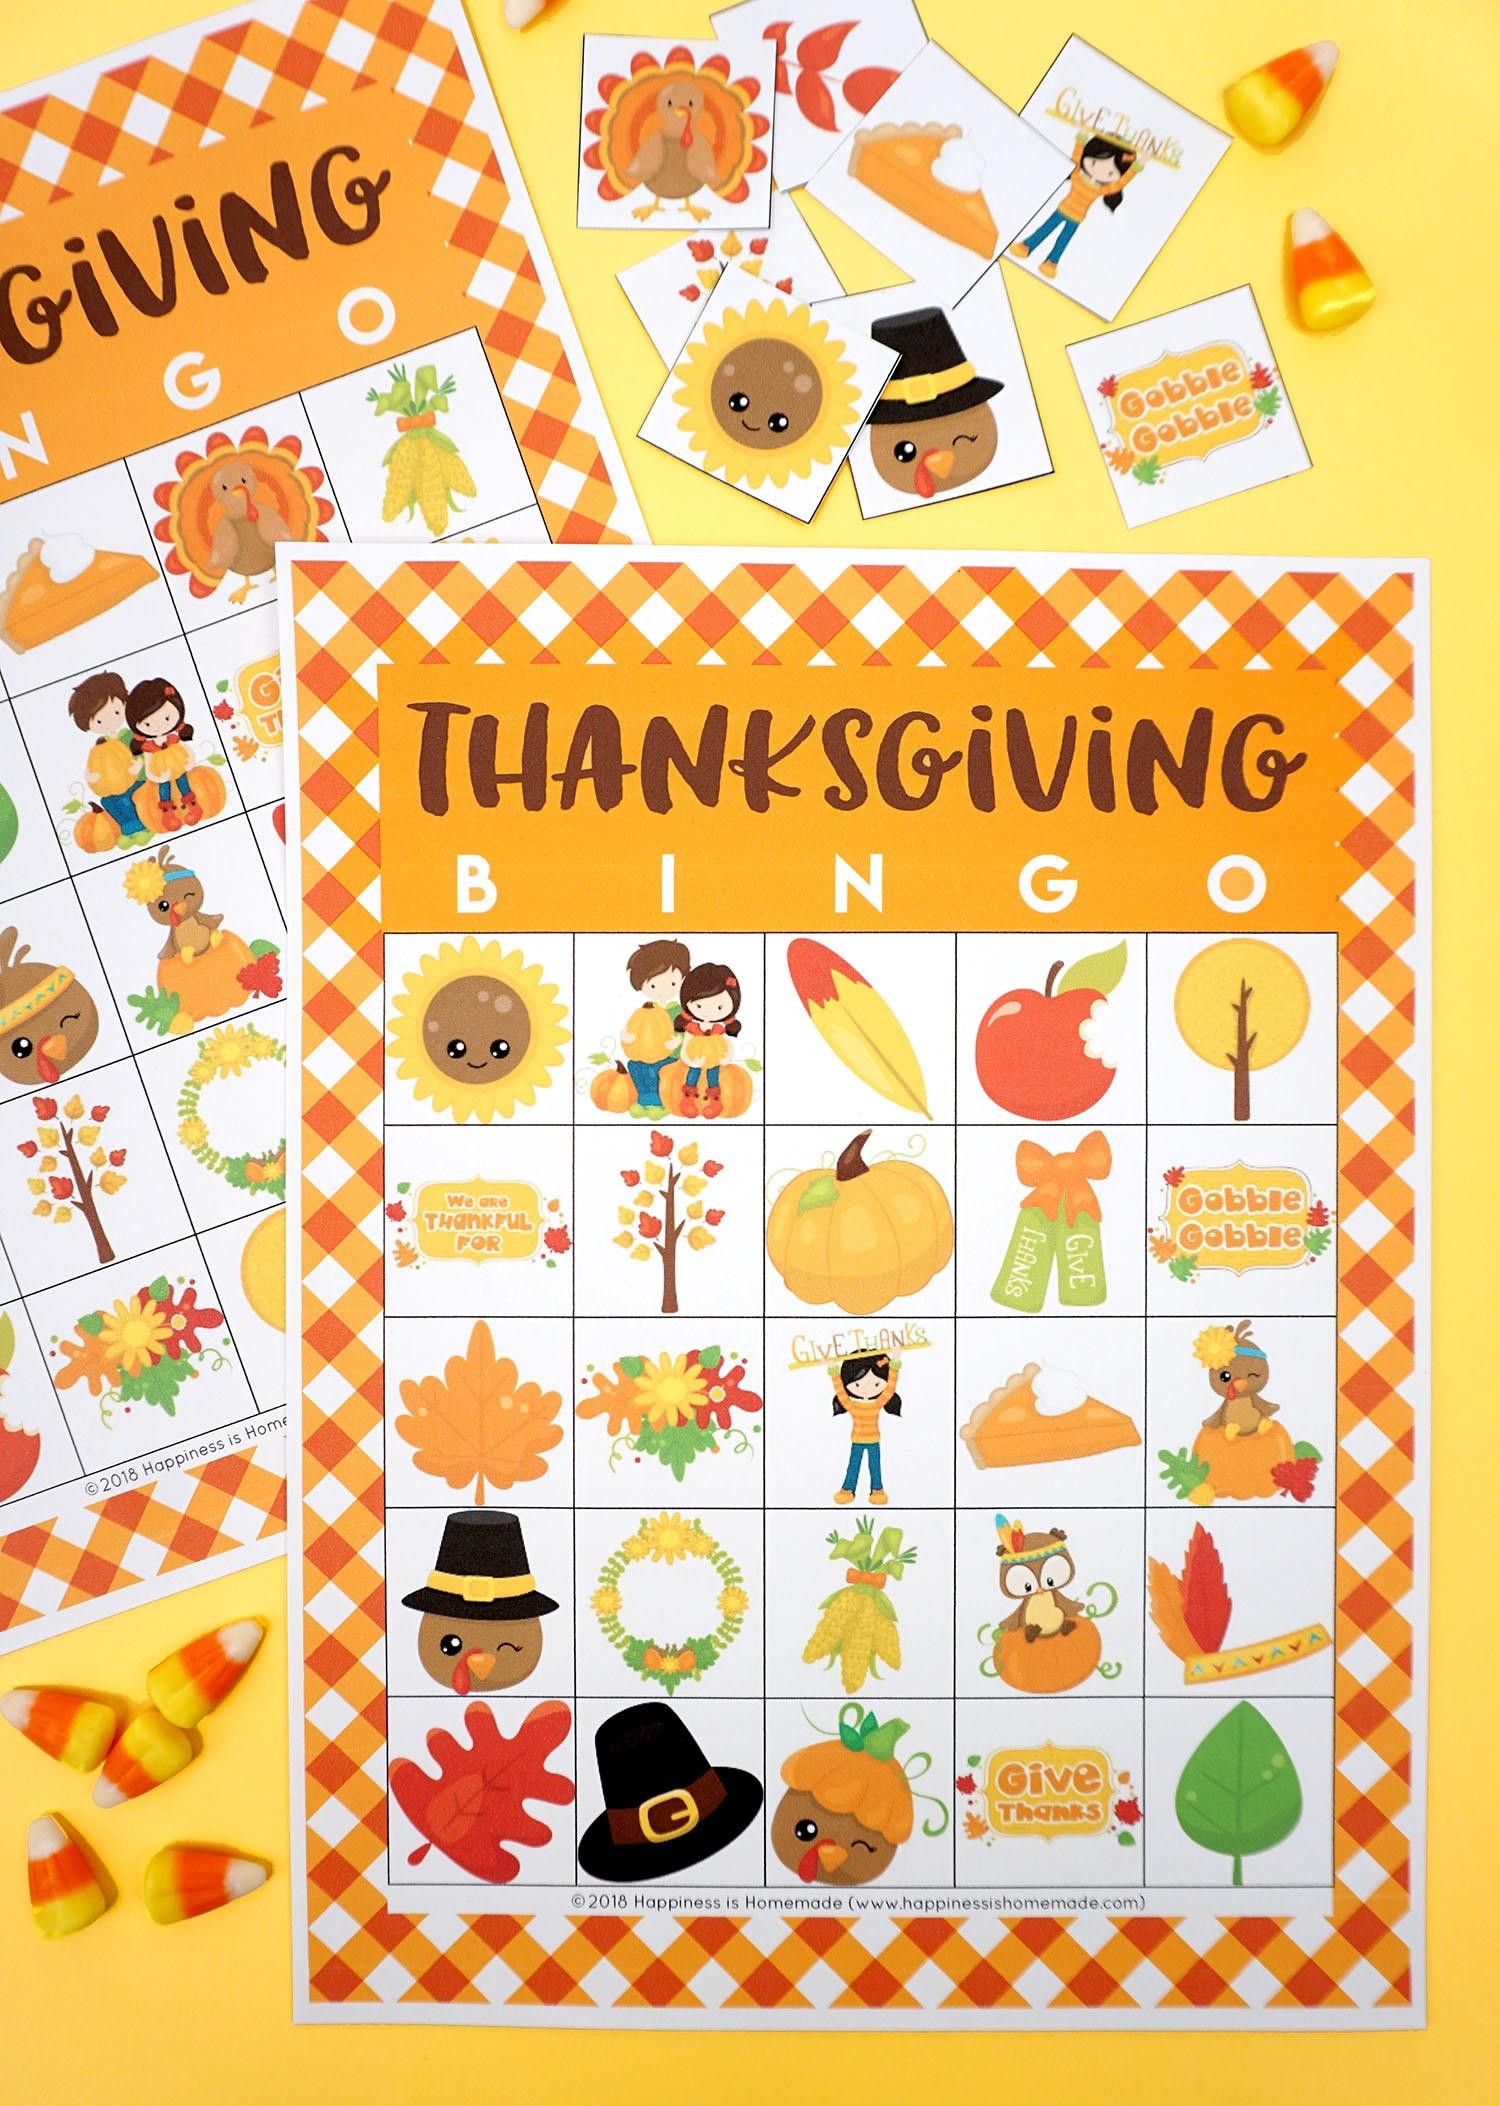 Free Printable Thanksgiving Bingo Cards - Happiness Is Homemade - Free Printable Thanksgiving Images